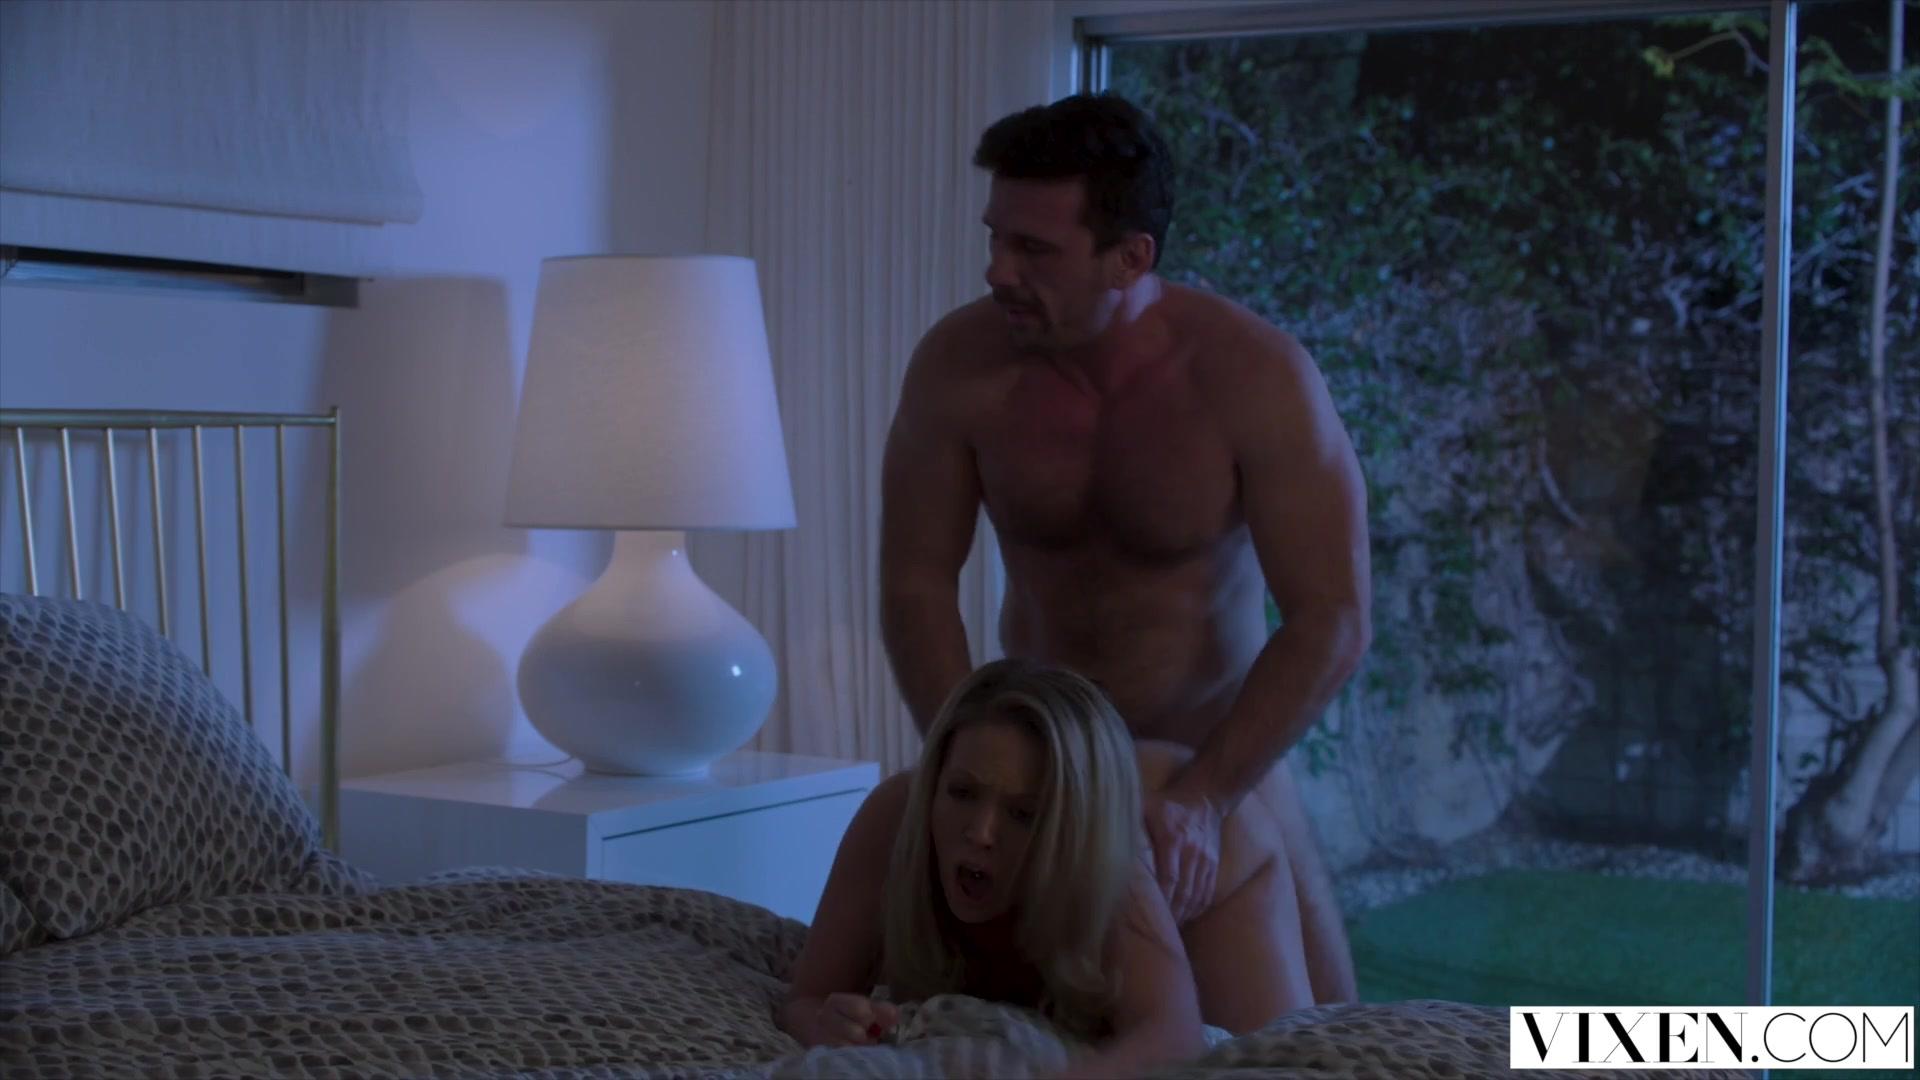 sex on a ball porn Best porno